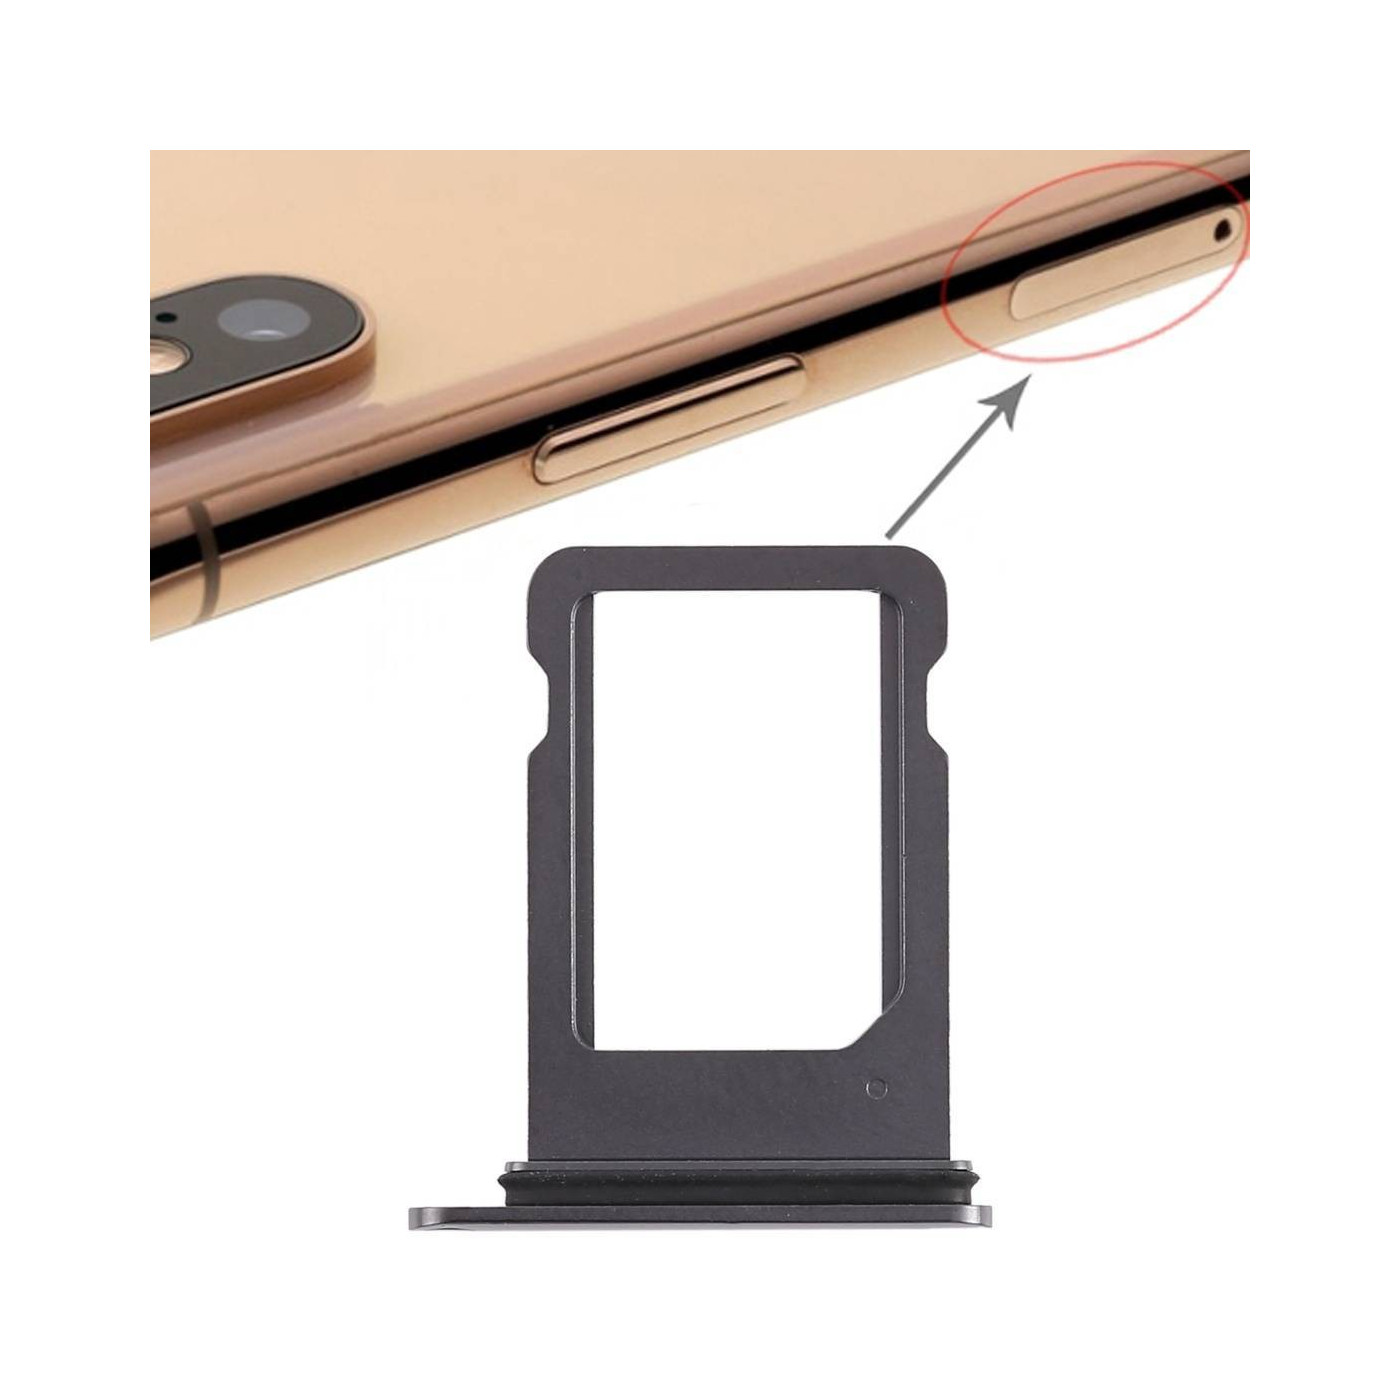 PORTA SIM SCHEDA Apple iPhone XS NERO SLOT SLITTA CARRELLO VASSOIO RICAMBIO